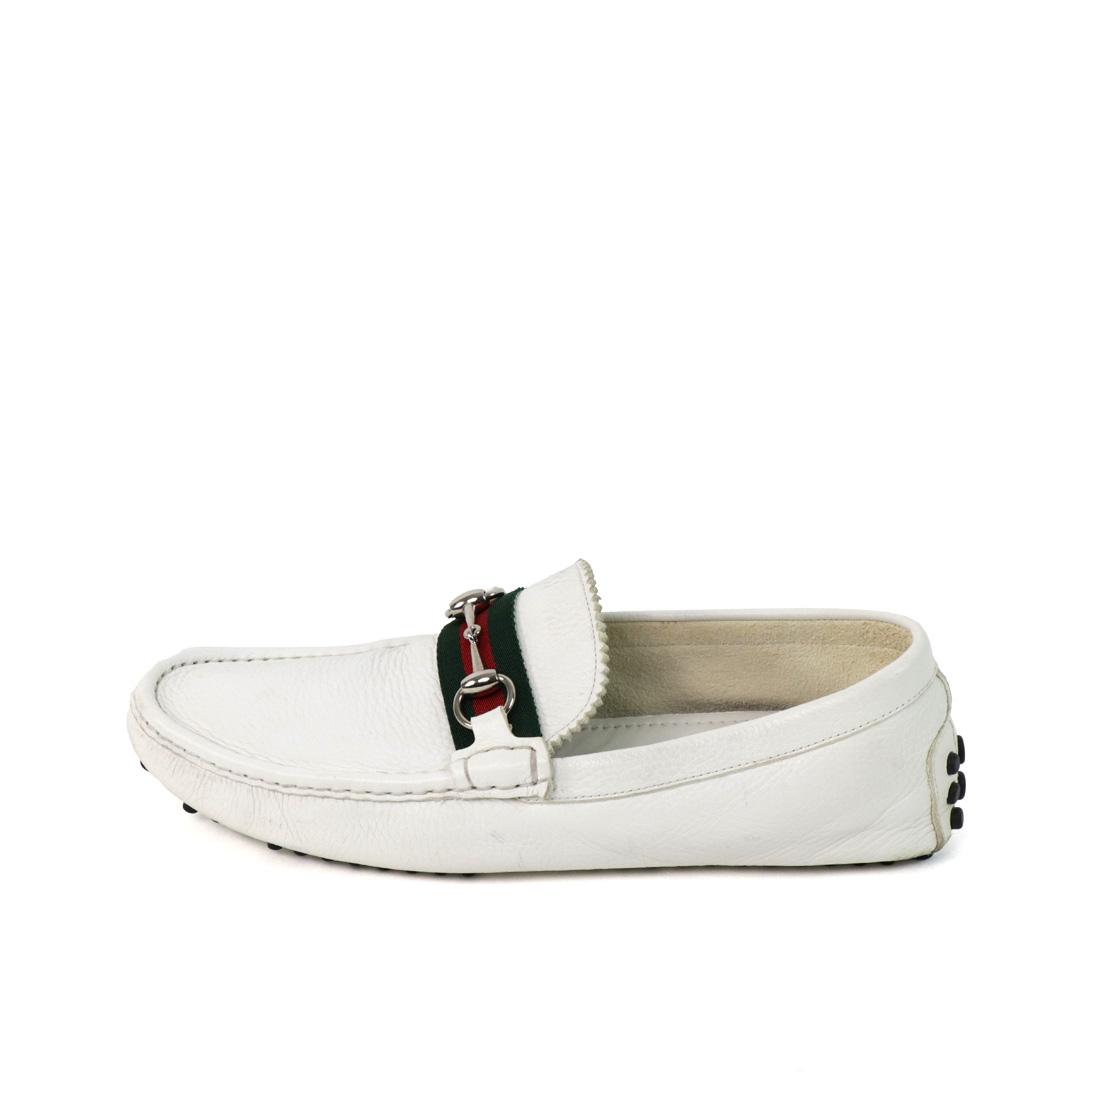 Gucci Men's White Leather Horsebit